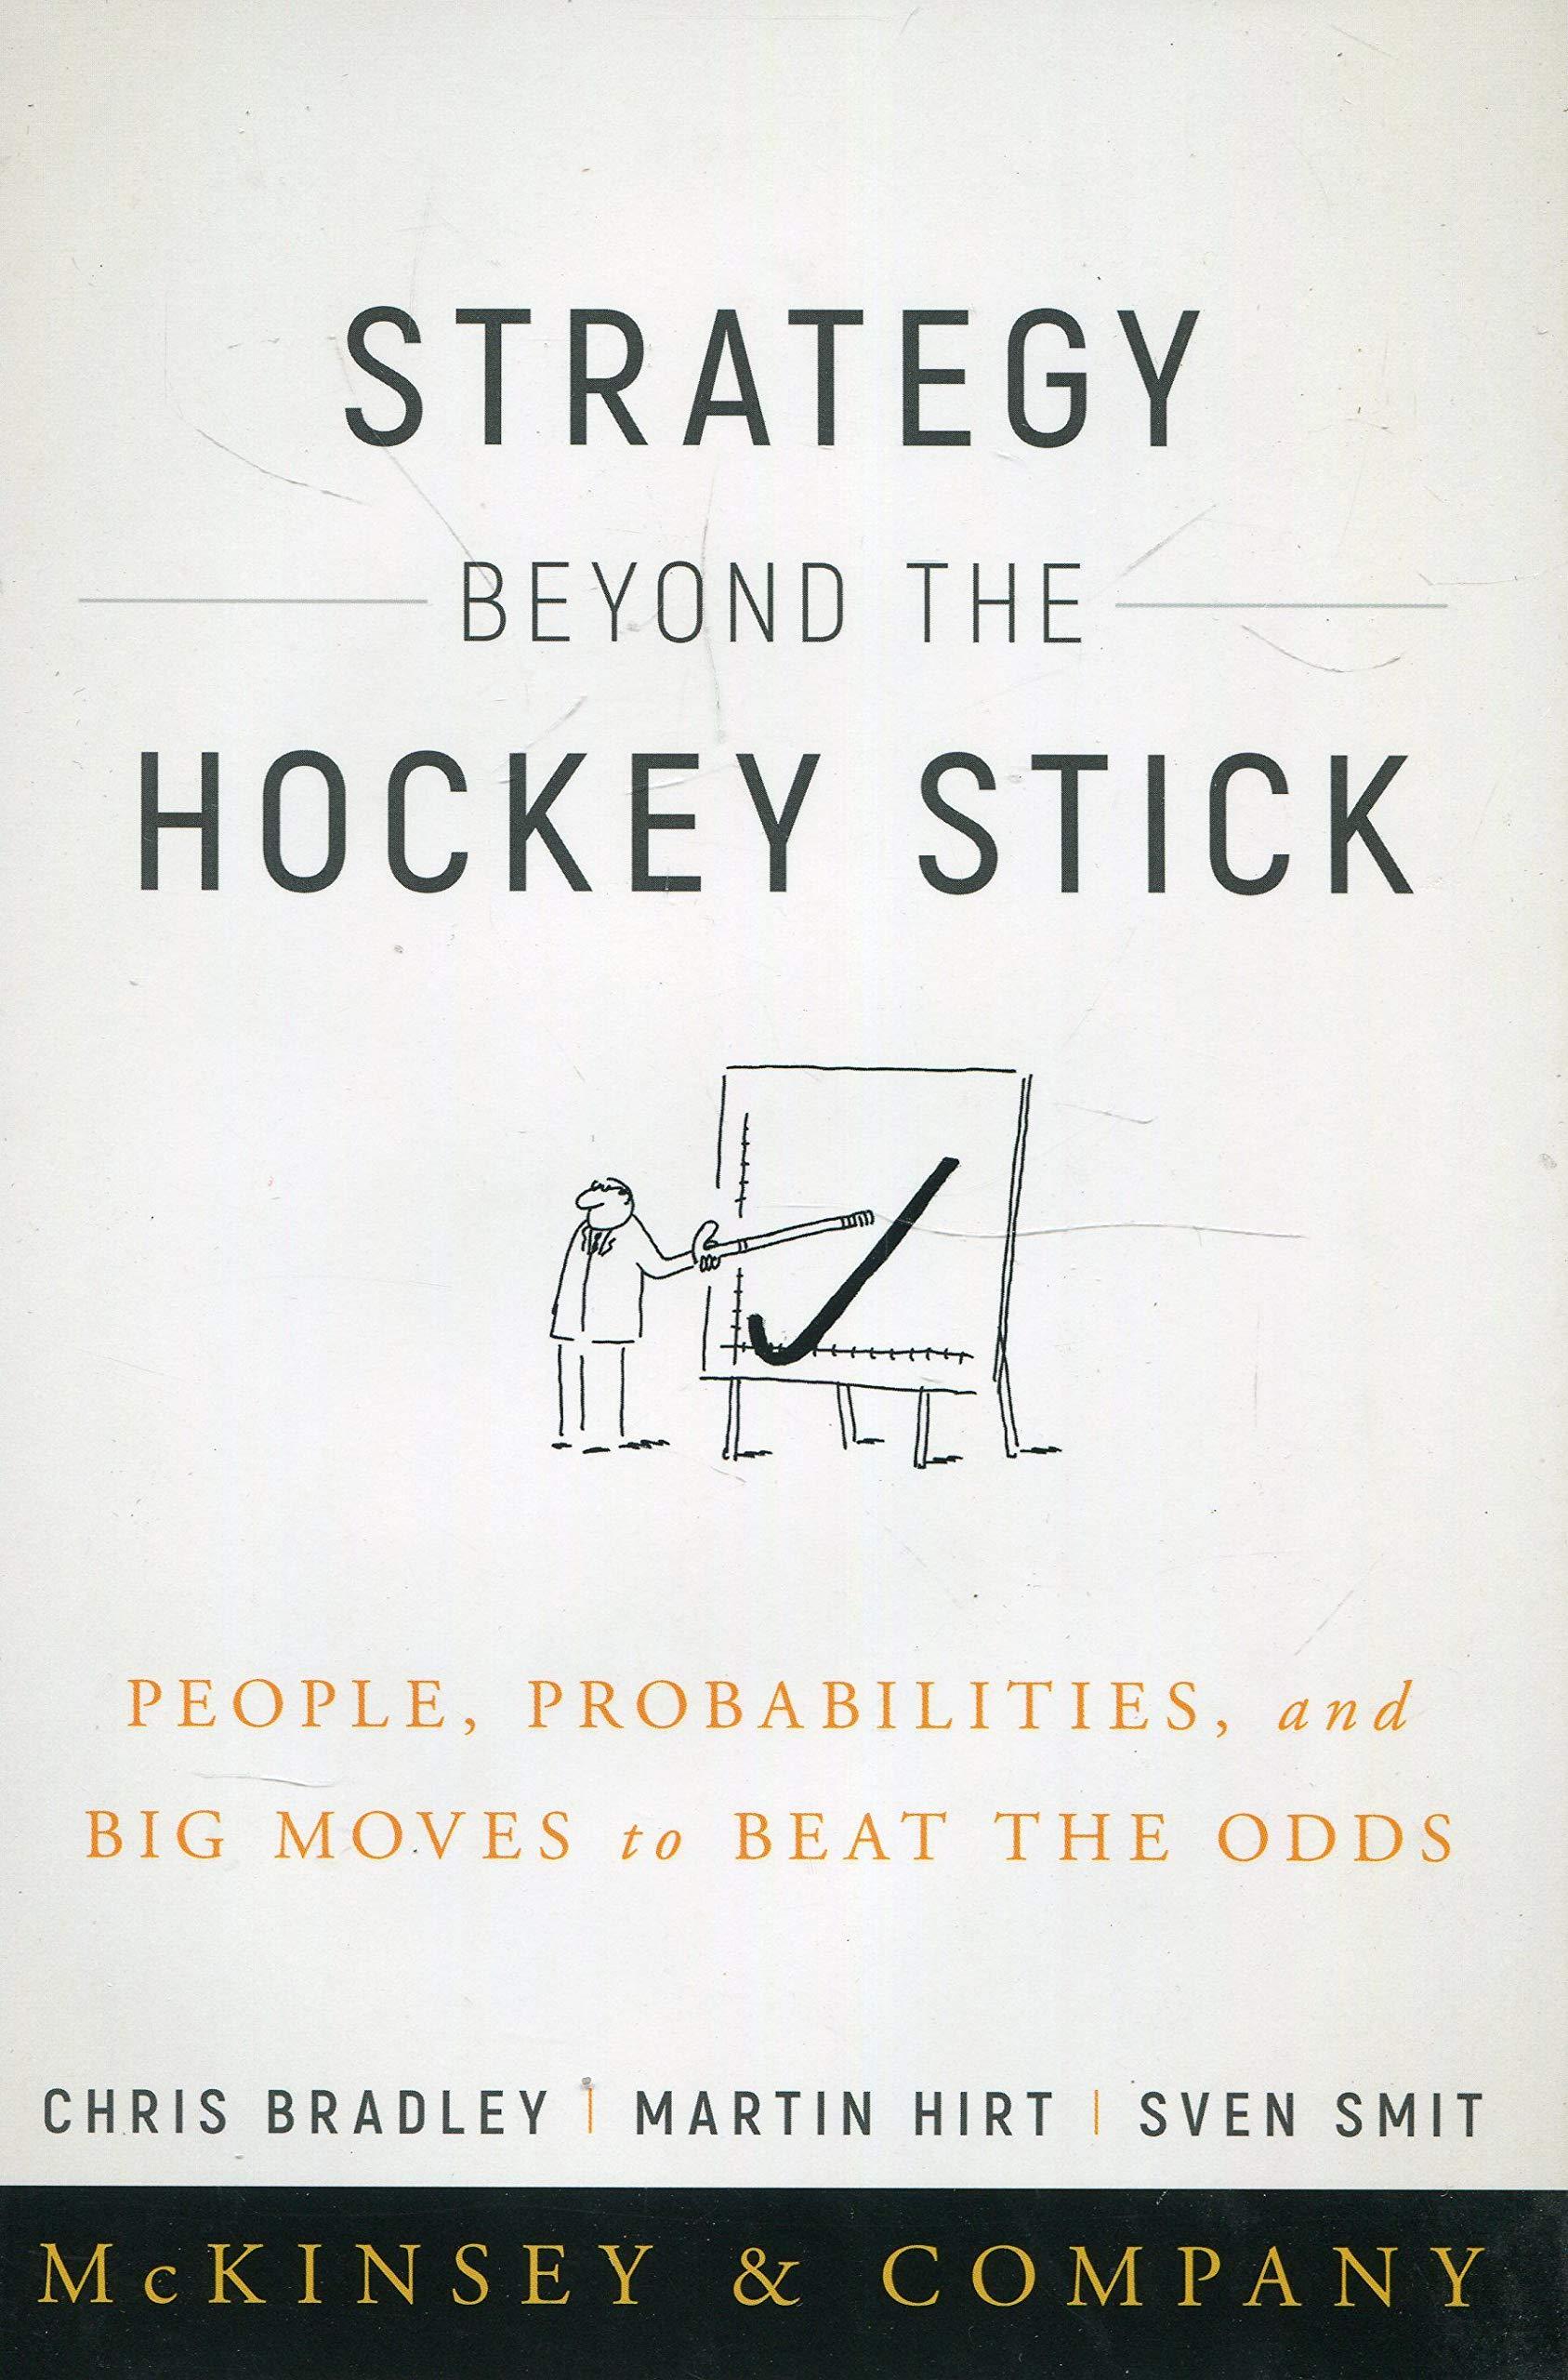 StrategyBeyondTheHockeyStick_McKinsey.jpg